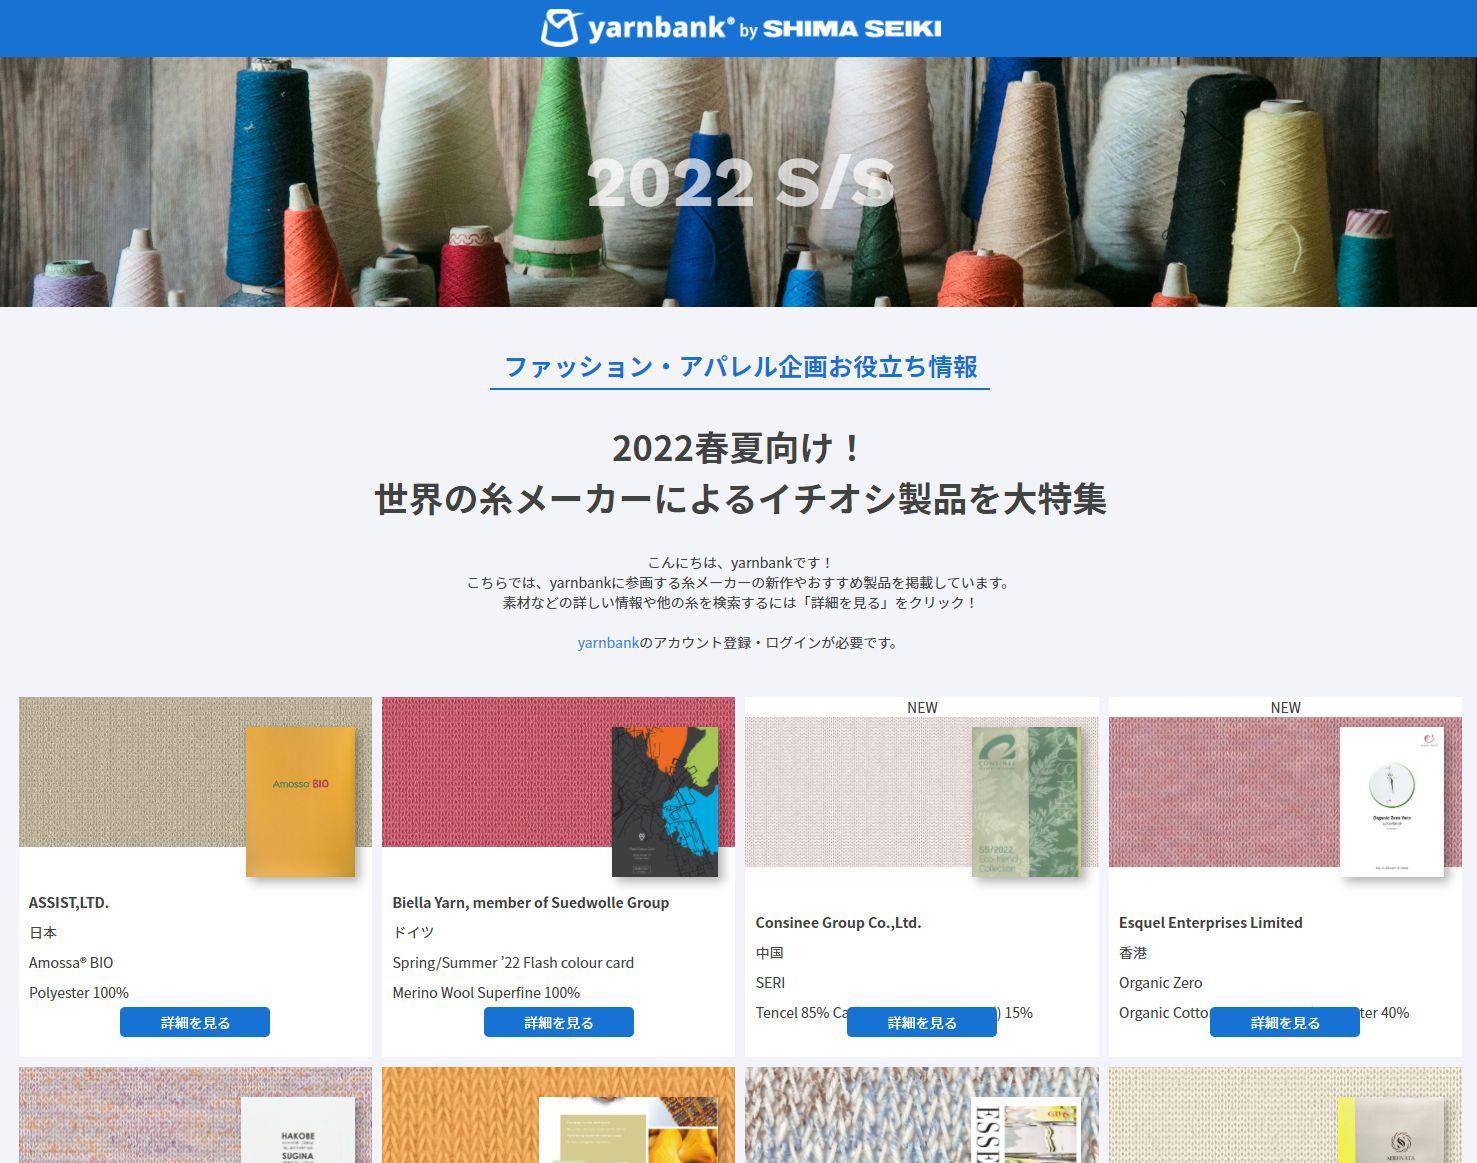 yarnbank presents 2022年春夏特設サイト